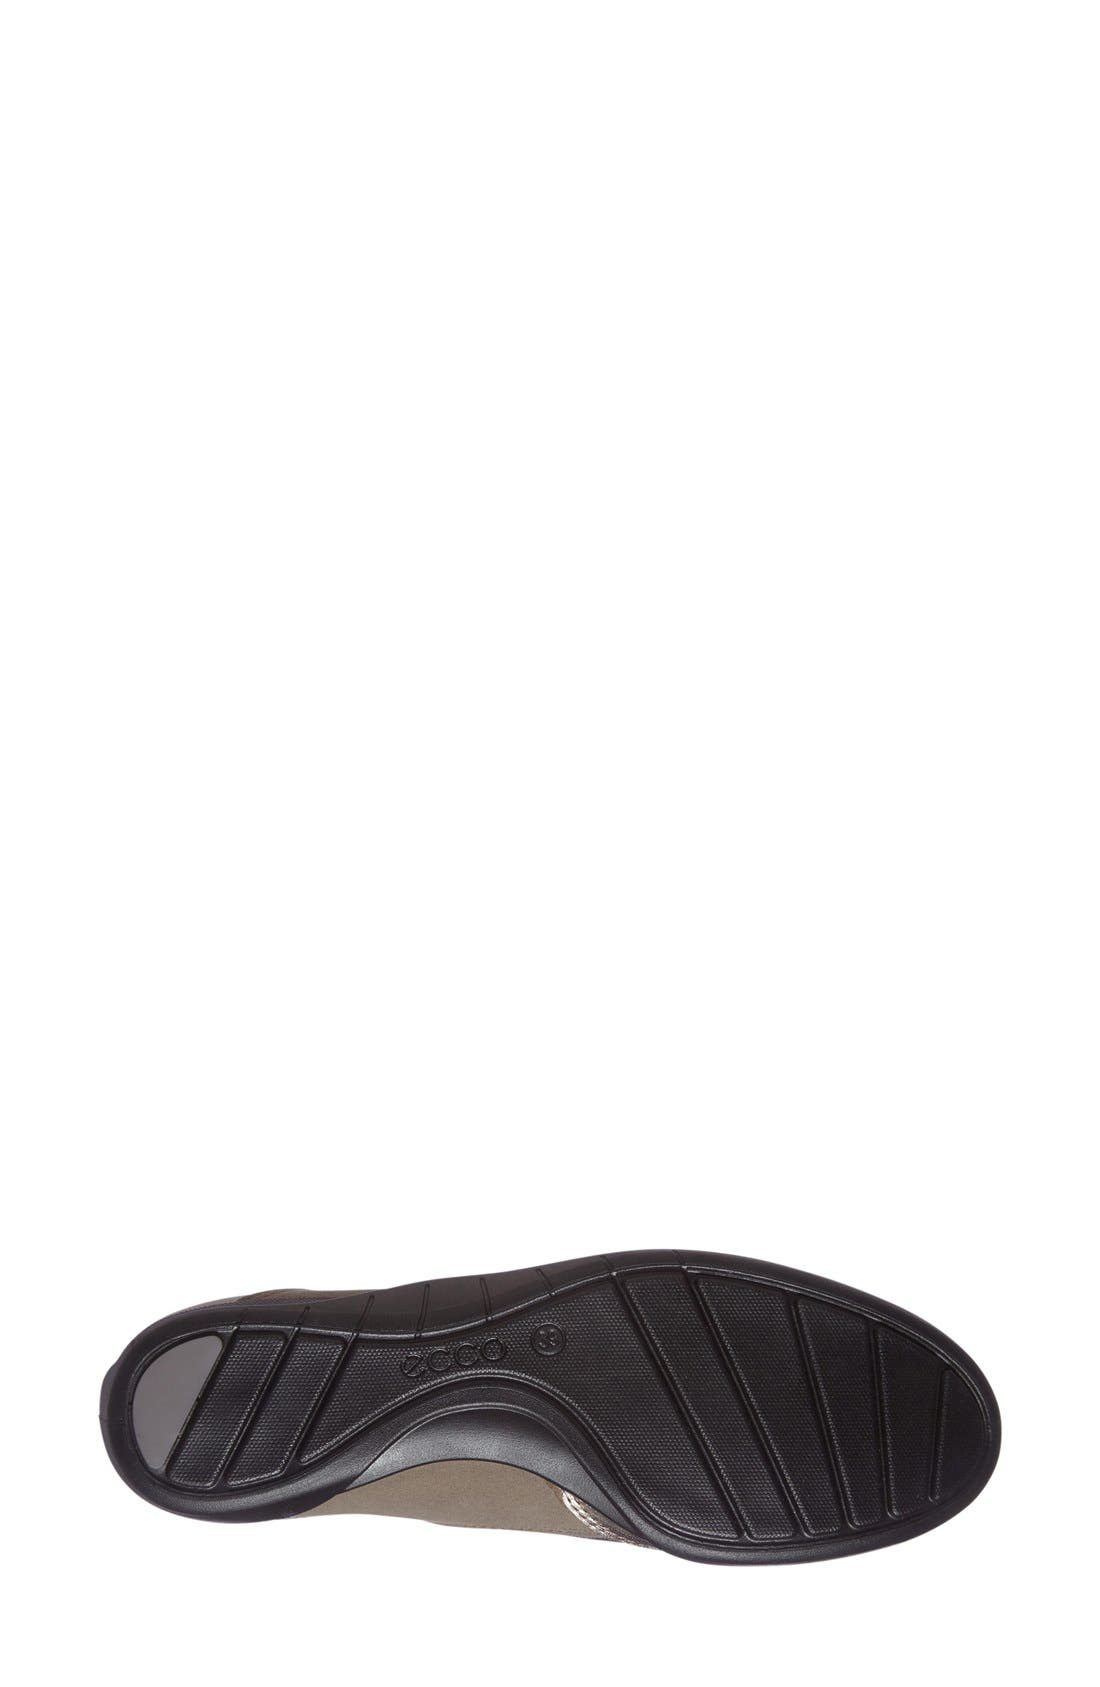 'Bluma' Sneaker,                             Alternate thumbnail 19, color,